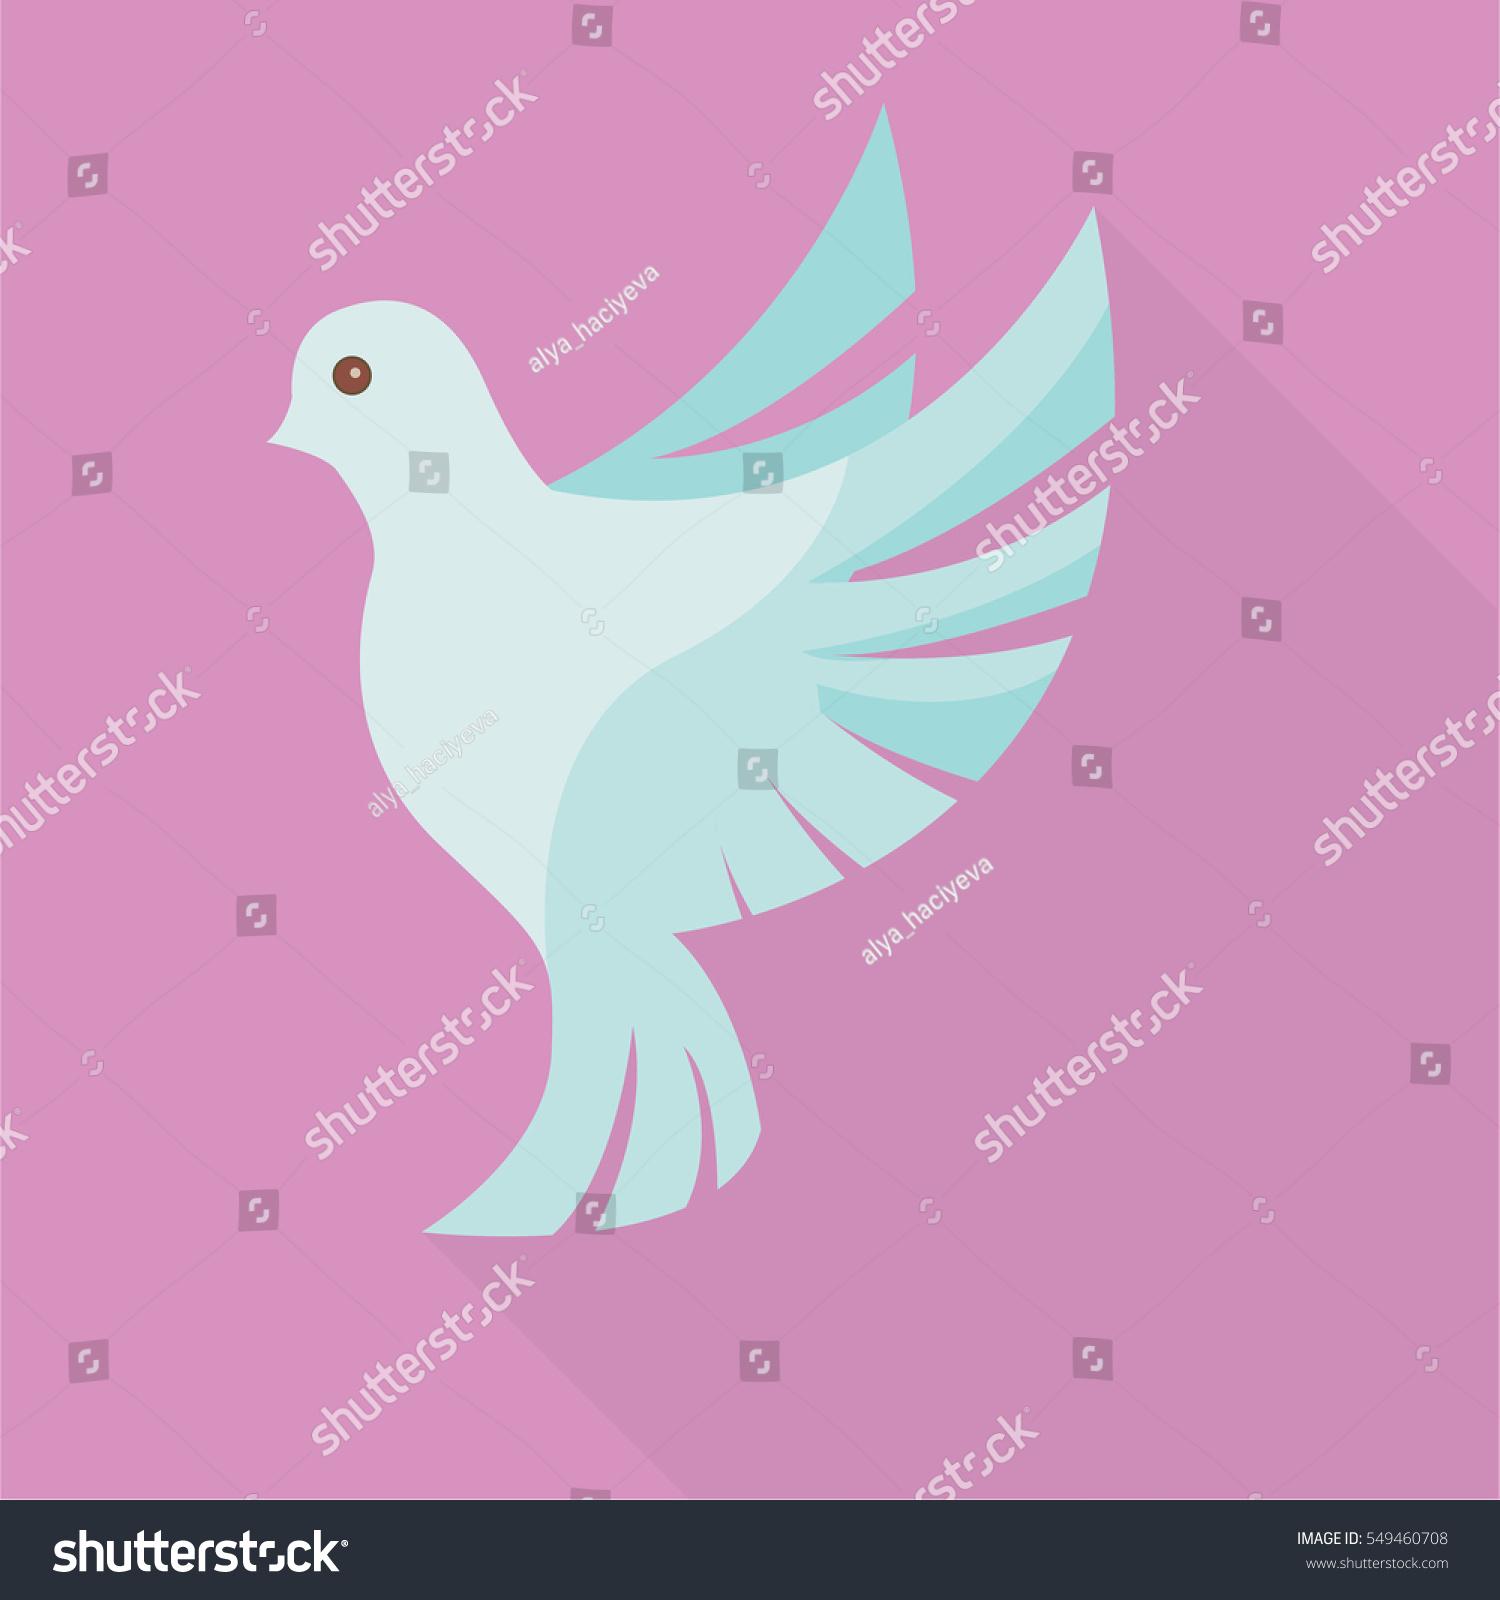 Wedding Dove Flat Icon Vector Illustrator Stock Vector HD (Royalty ...